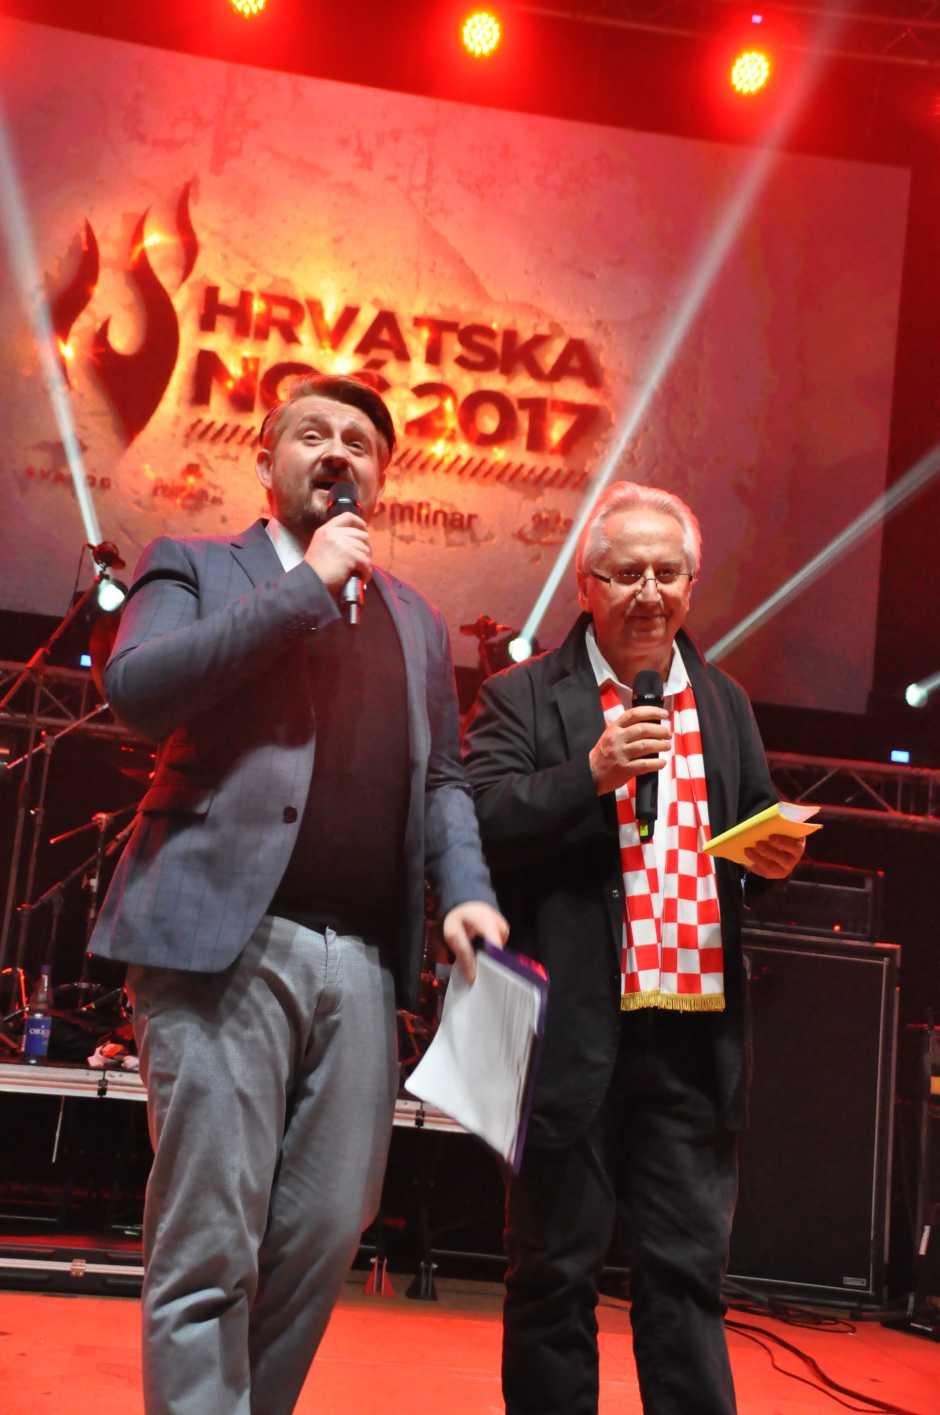 hrv noc 2017 (4)